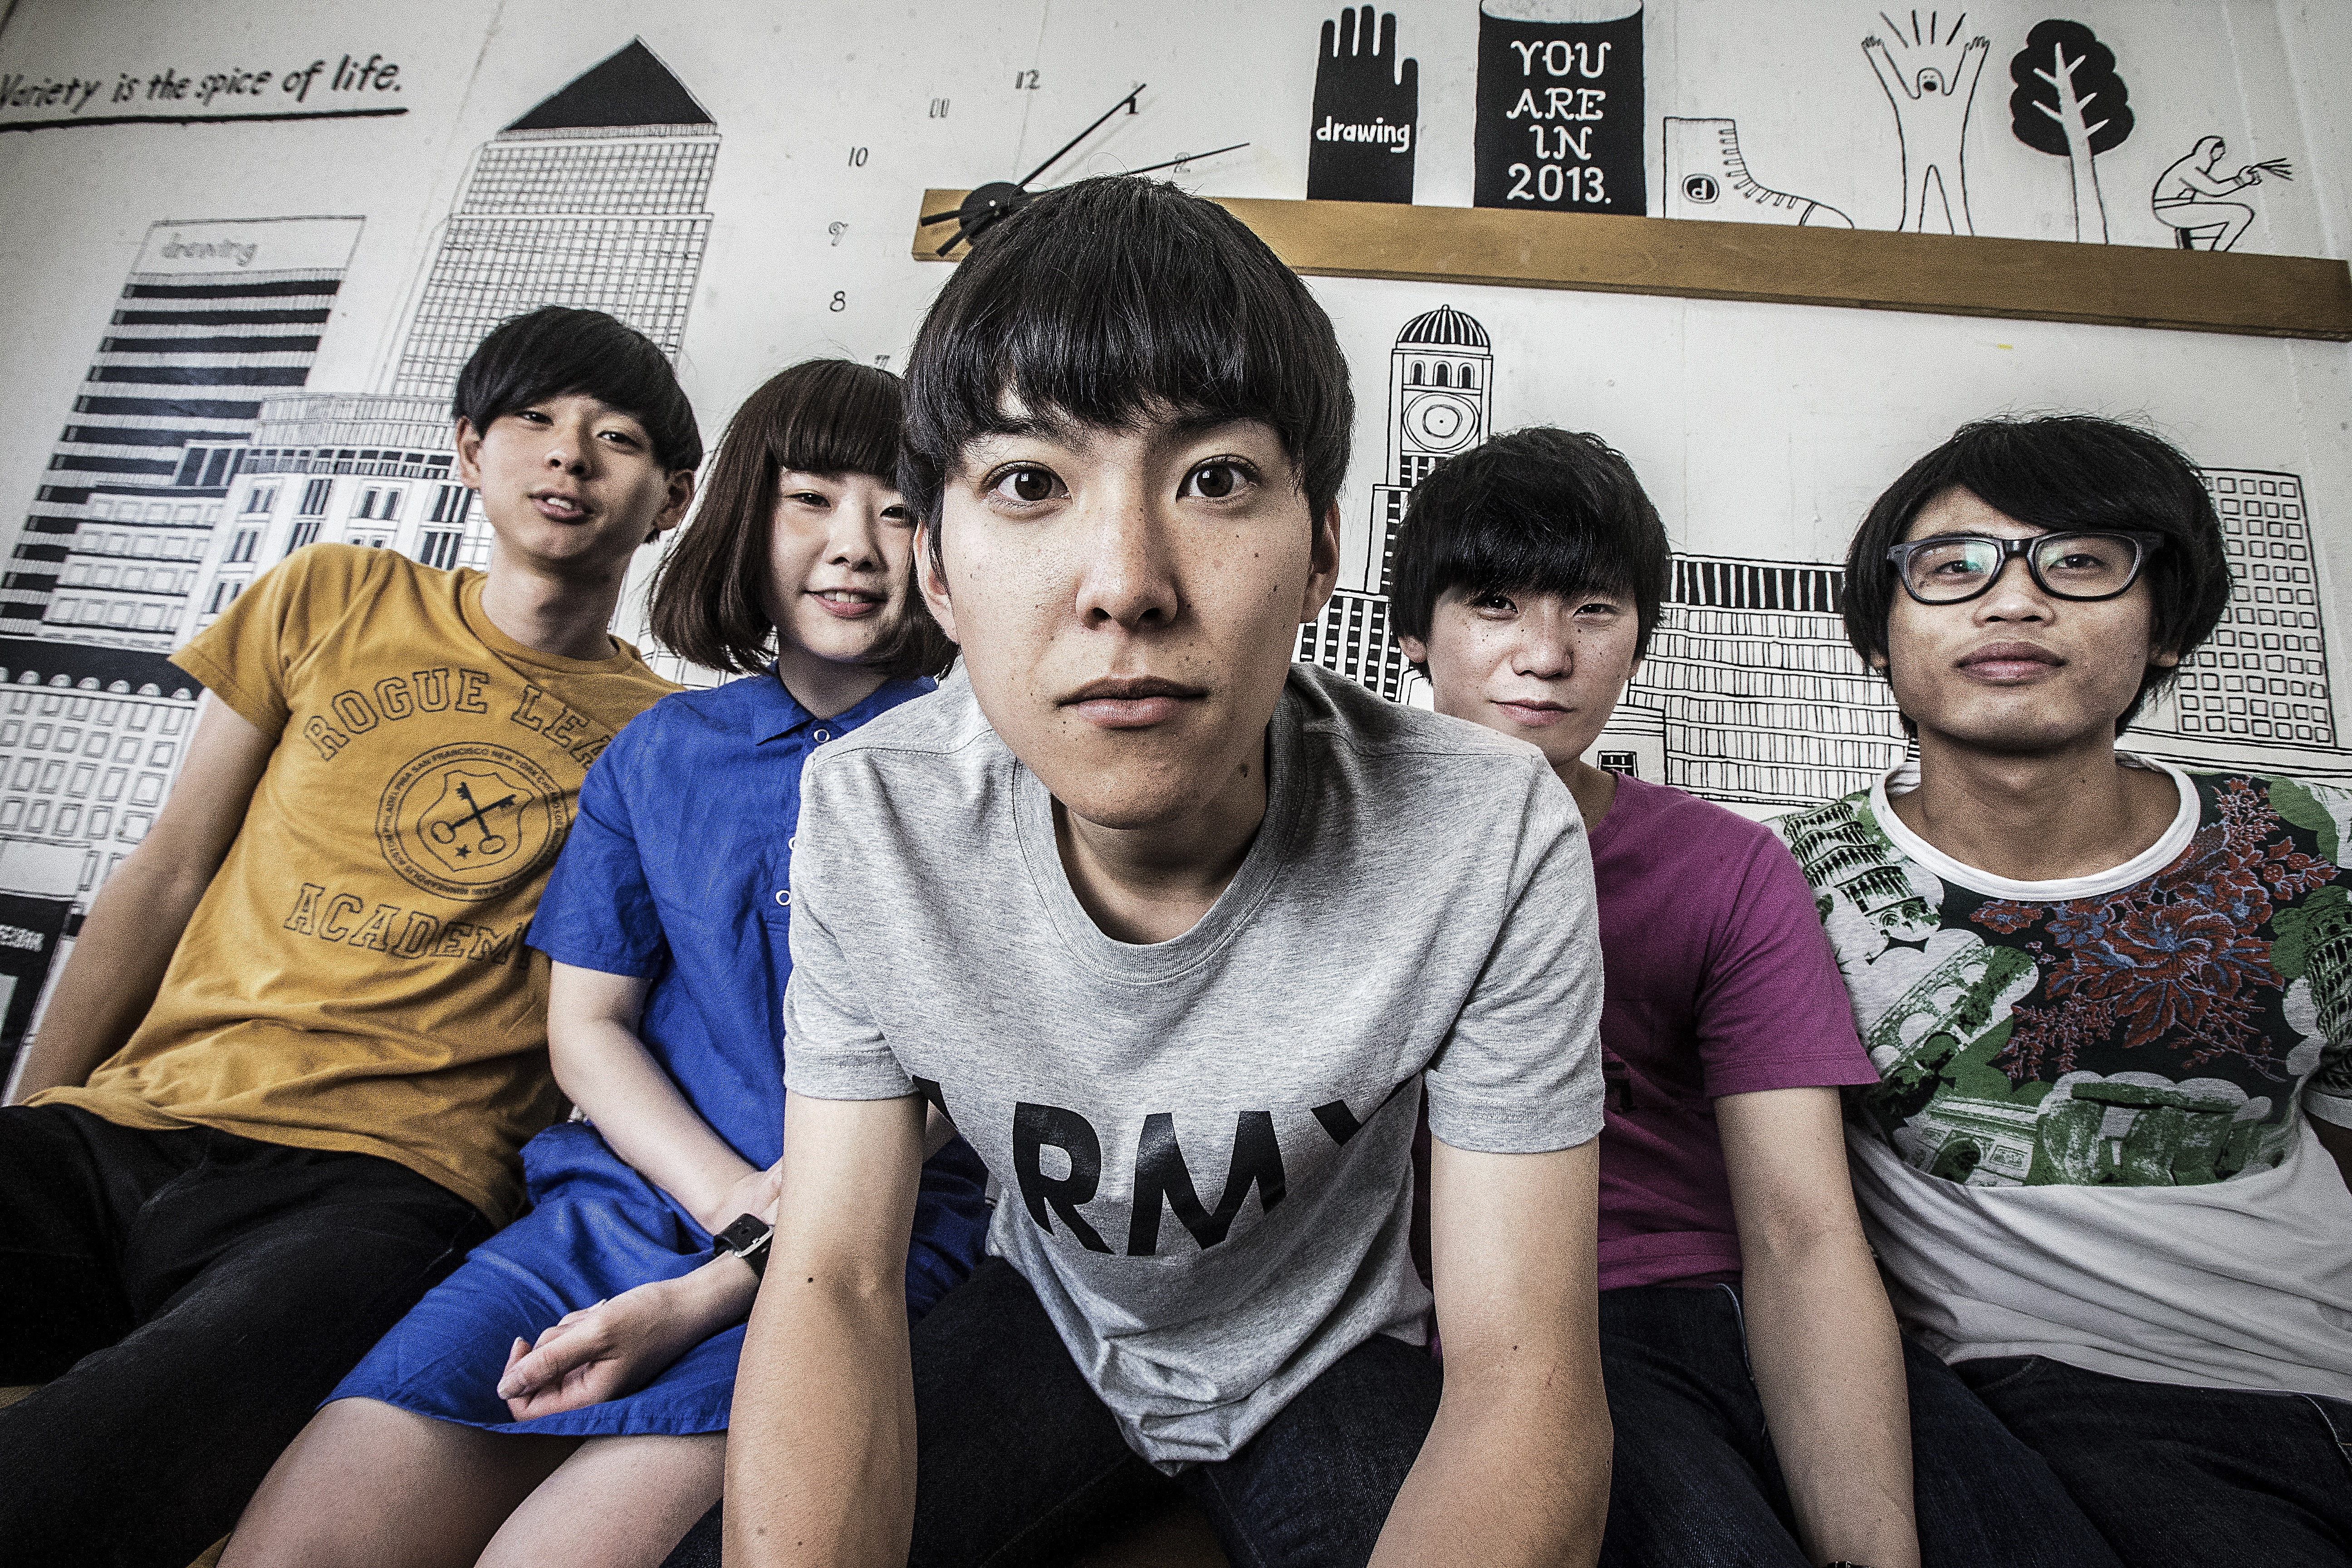 L→R  イラミナタカヒロ(Ba&Cho&Bongos)、エイリアン(Key&Vo)、中川智貴(Vo&AG&Whistle)、岡安真司(Gu&Key&Cho)、ノザキショウタ(Dr&Cho)